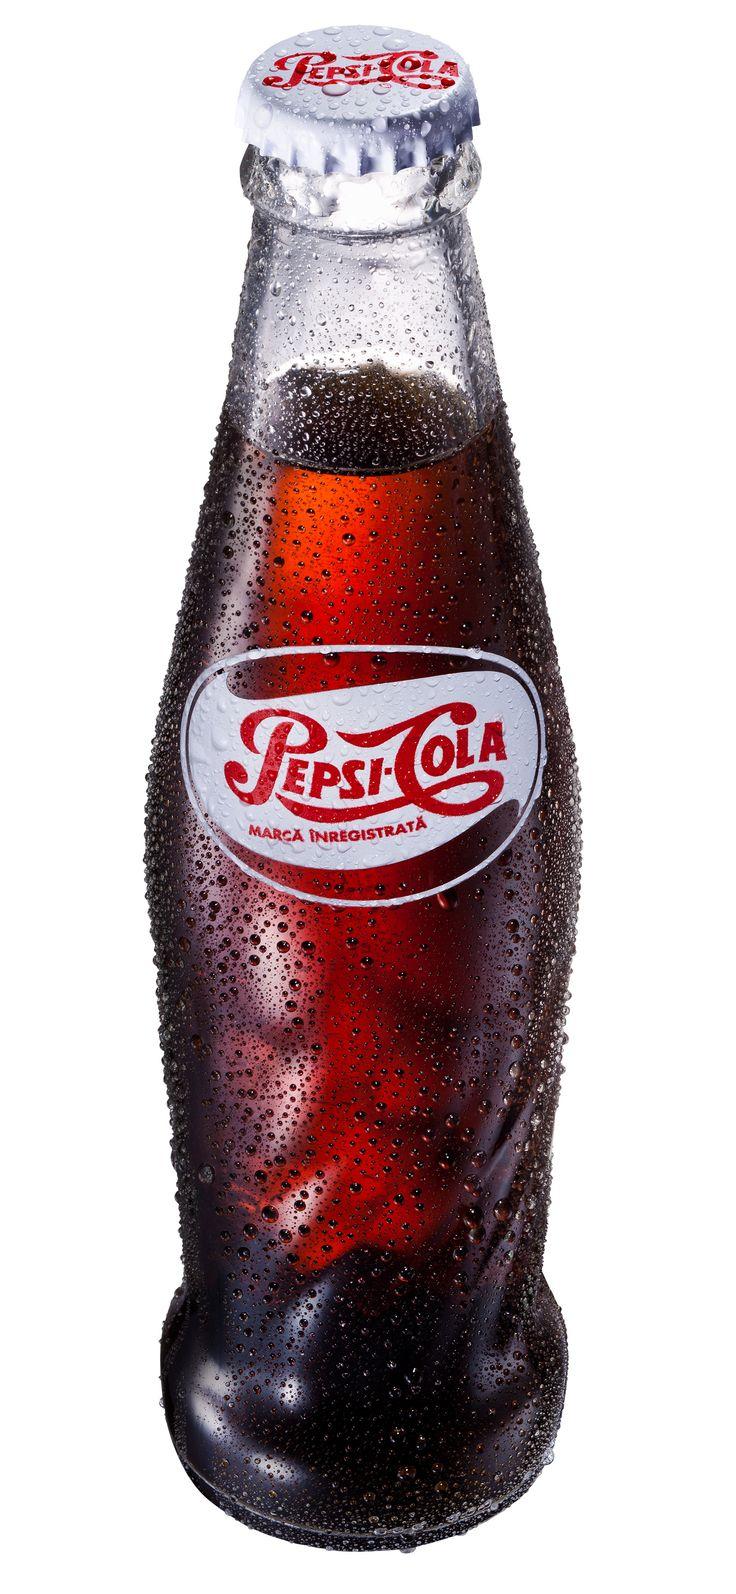 Pepsi Cola Images Pepsi Cola Si Ieri Azi Noua Campanie